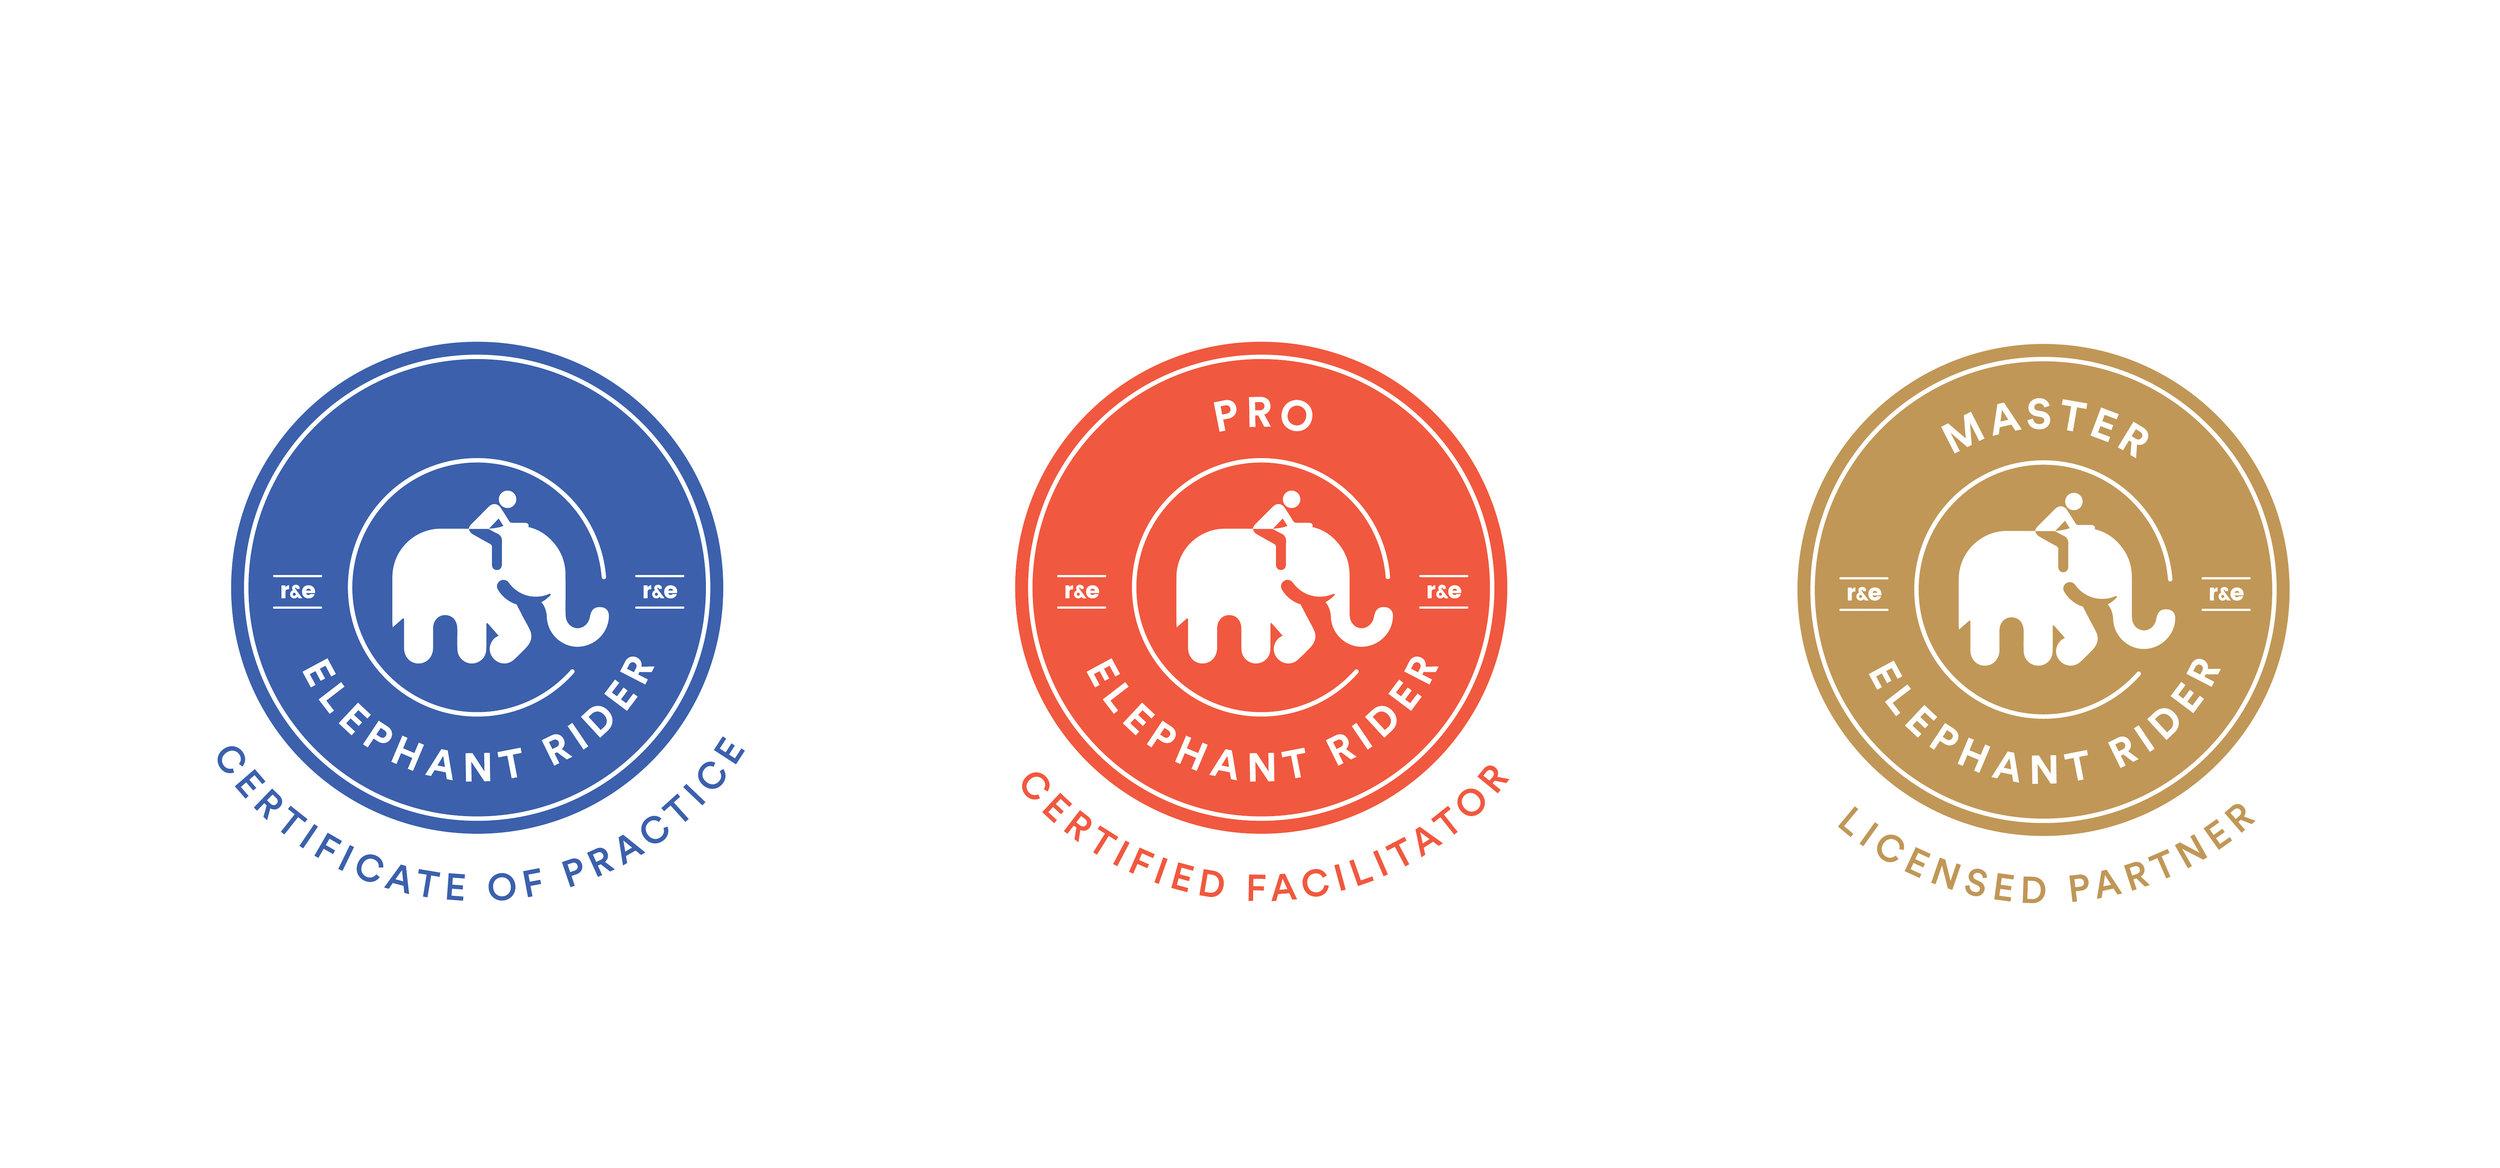 Elephant Riders Partner Logos.jpg